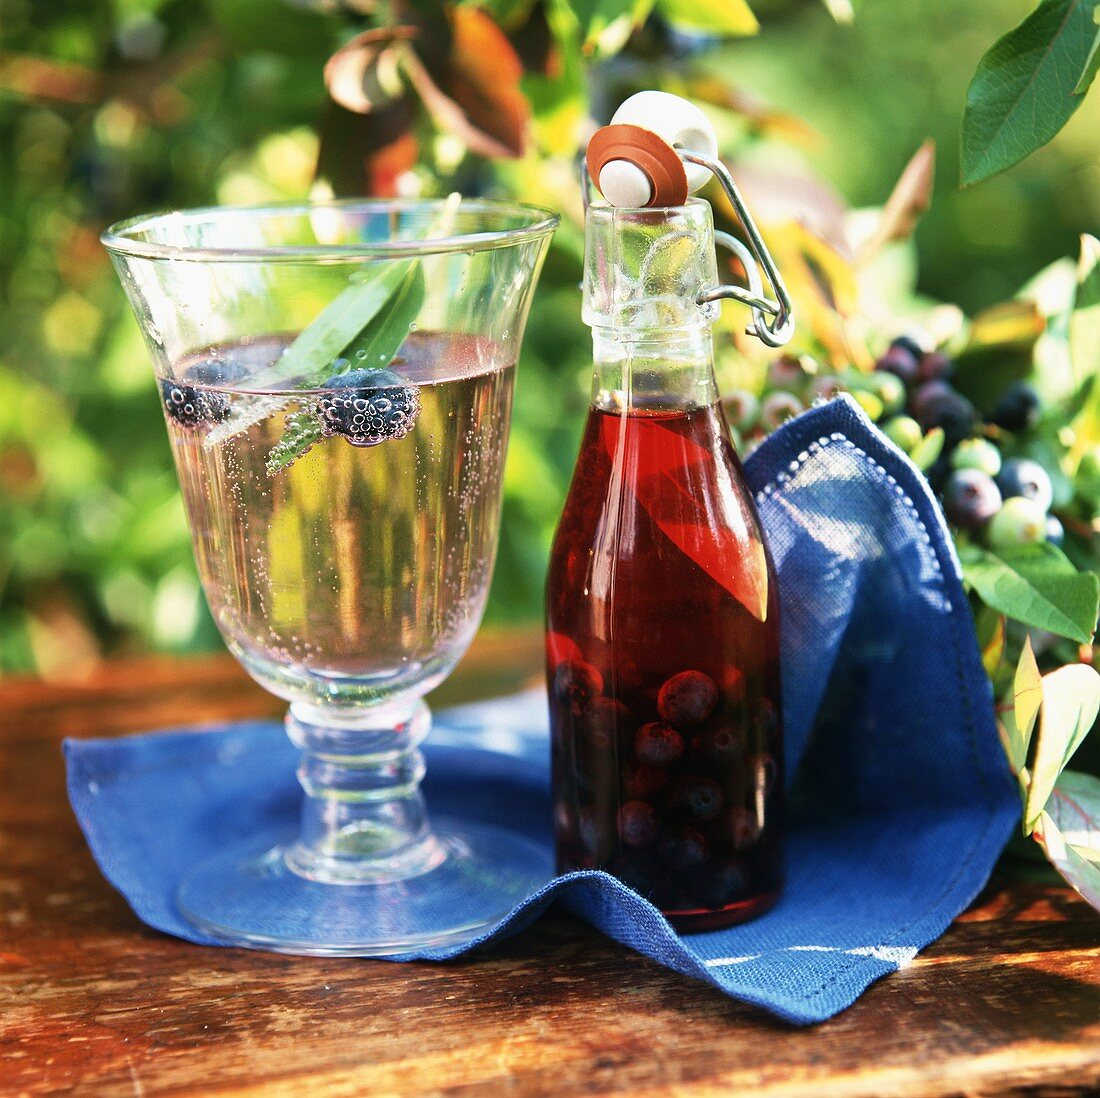 Apple schorle with blueberries, bottle of blueberry vinegar